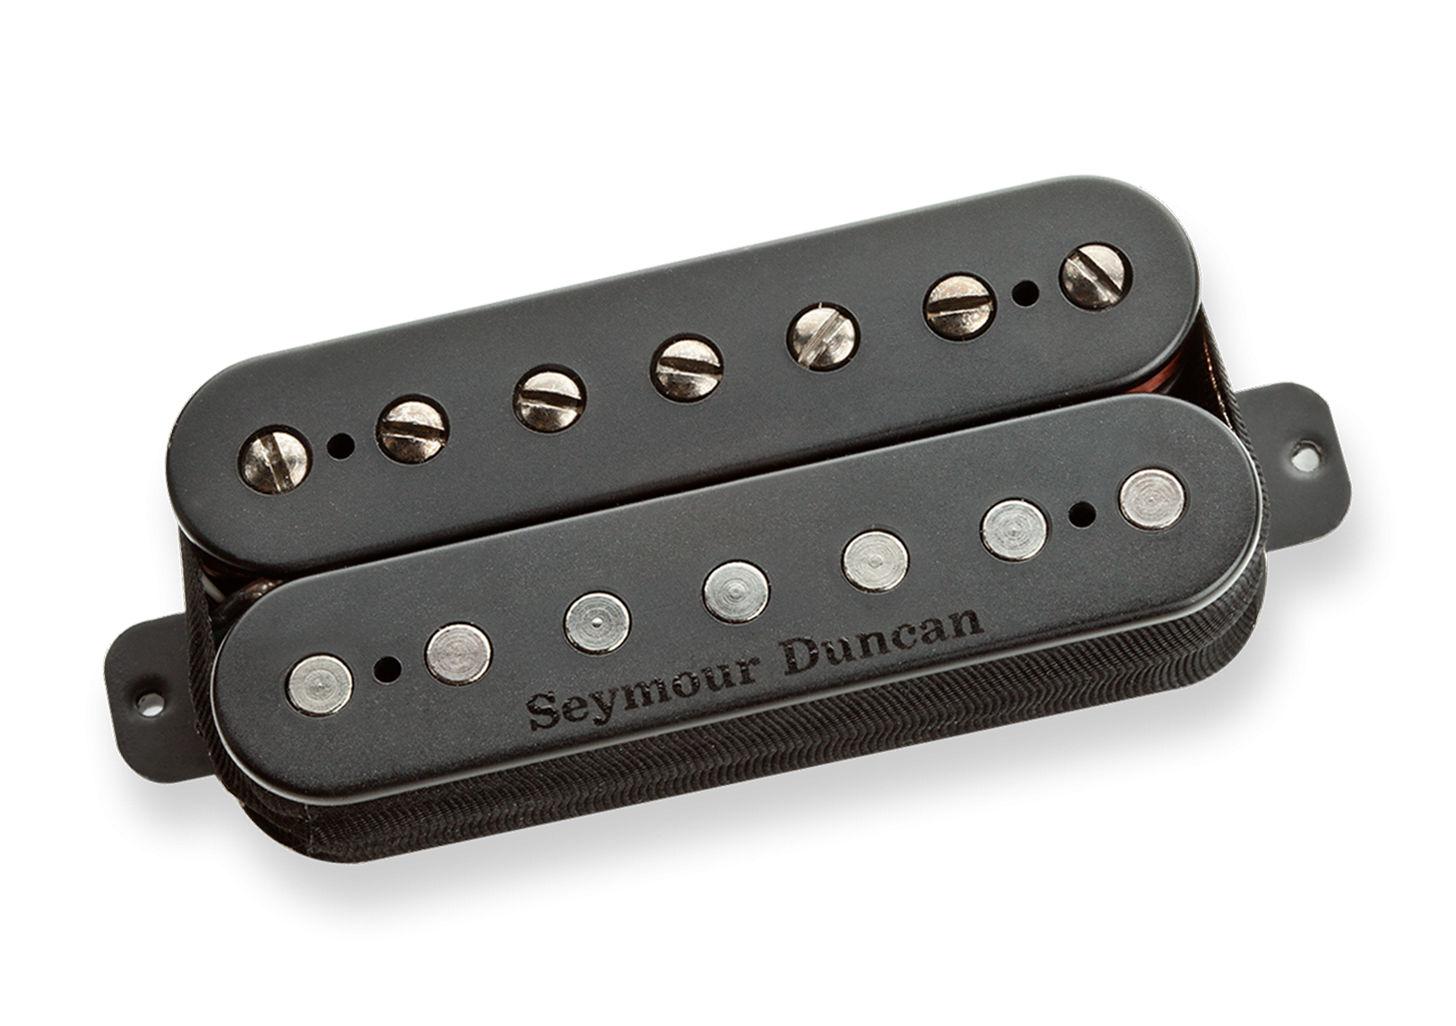 Seymour Duncan Sentient Humbucker - 7 String Neck Passive Mount Black